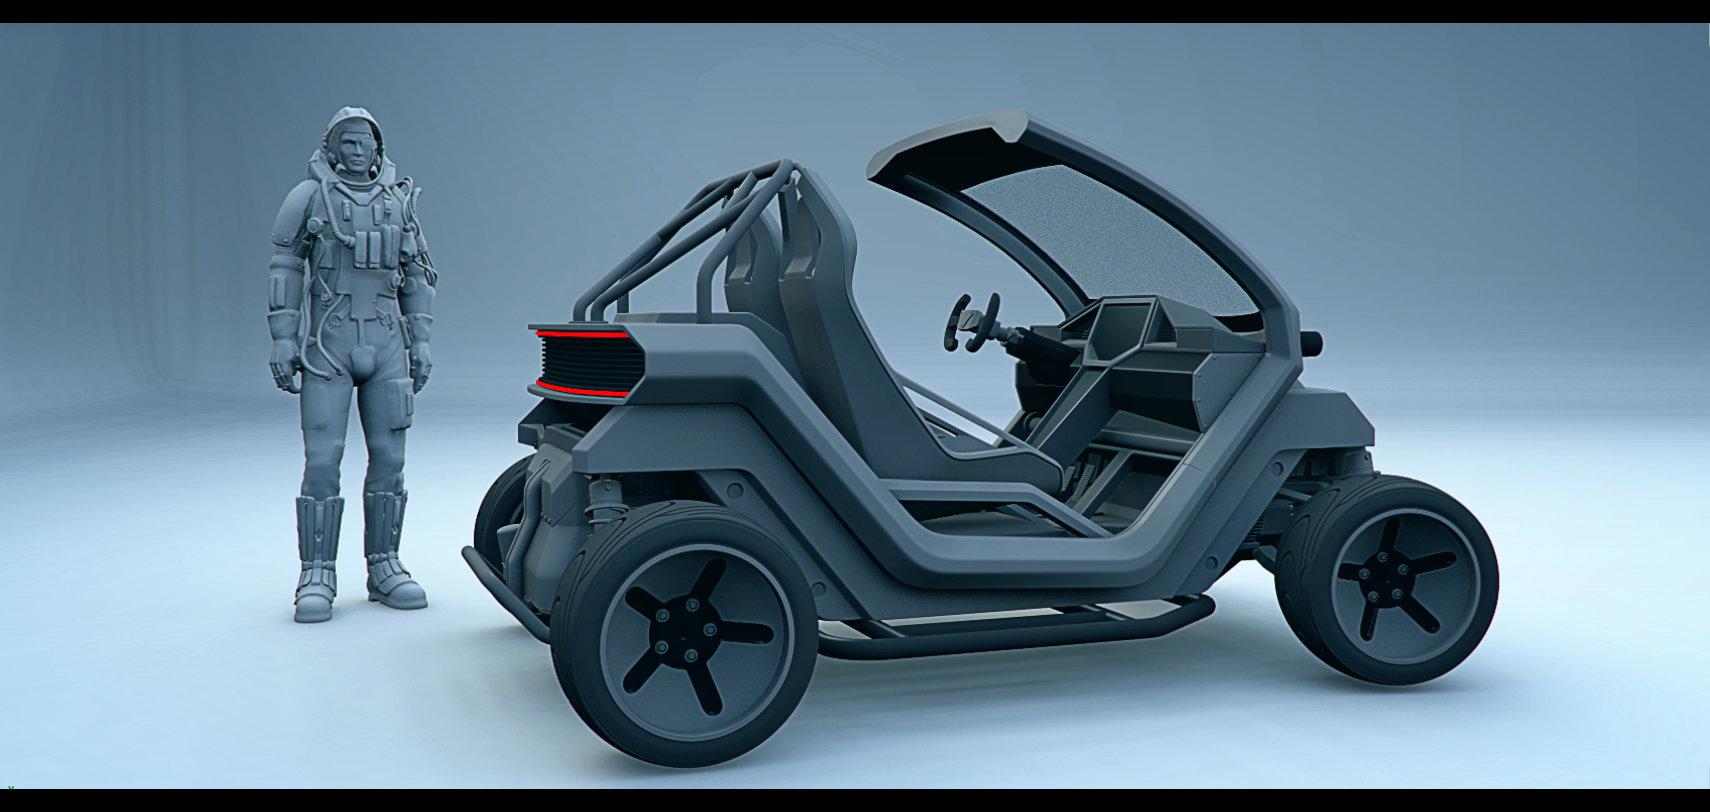 Nathan dearsley buggy concept 1